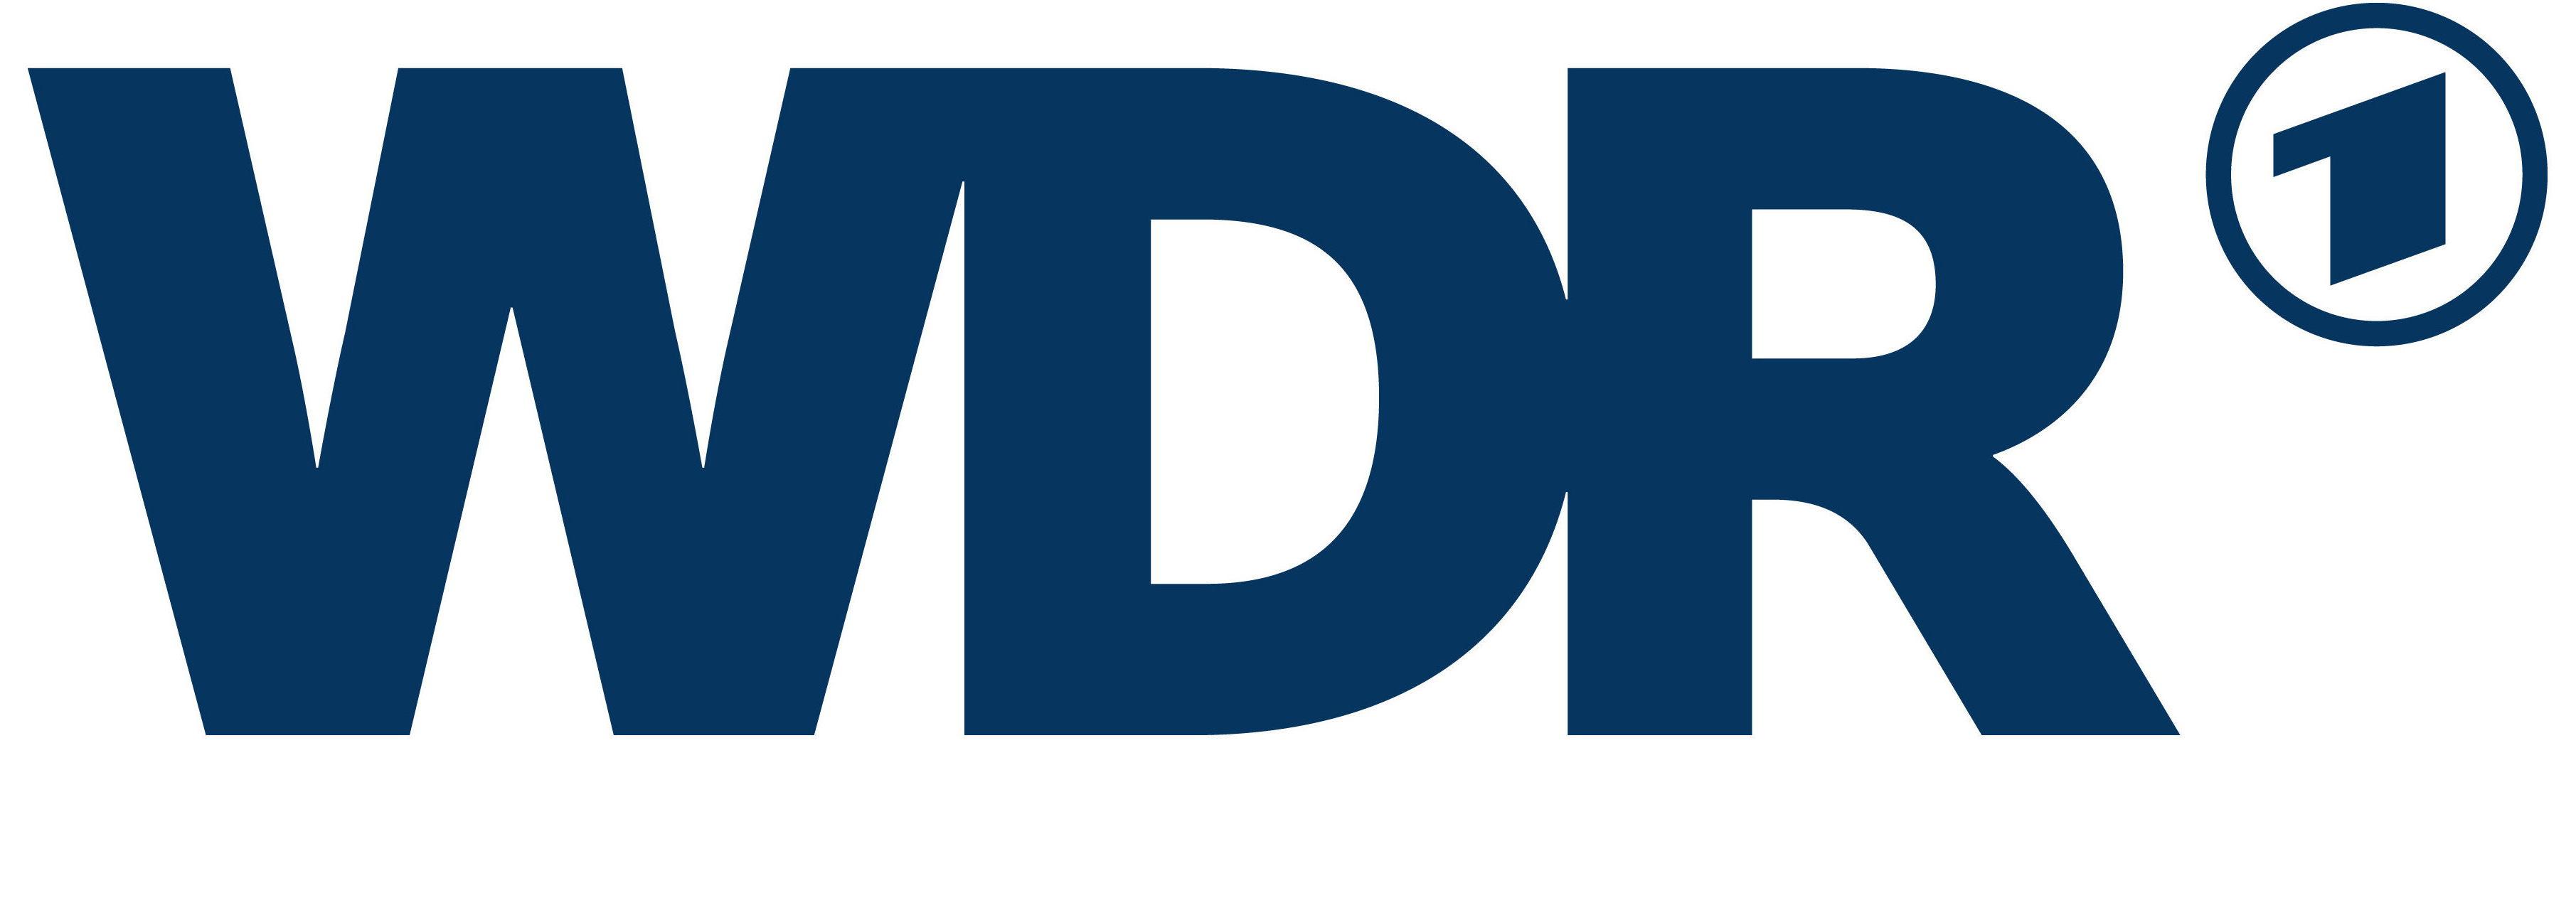 Duesseldorf-Info.de - Düsseldorf Infos & Düsseldorf Tipps | WDR